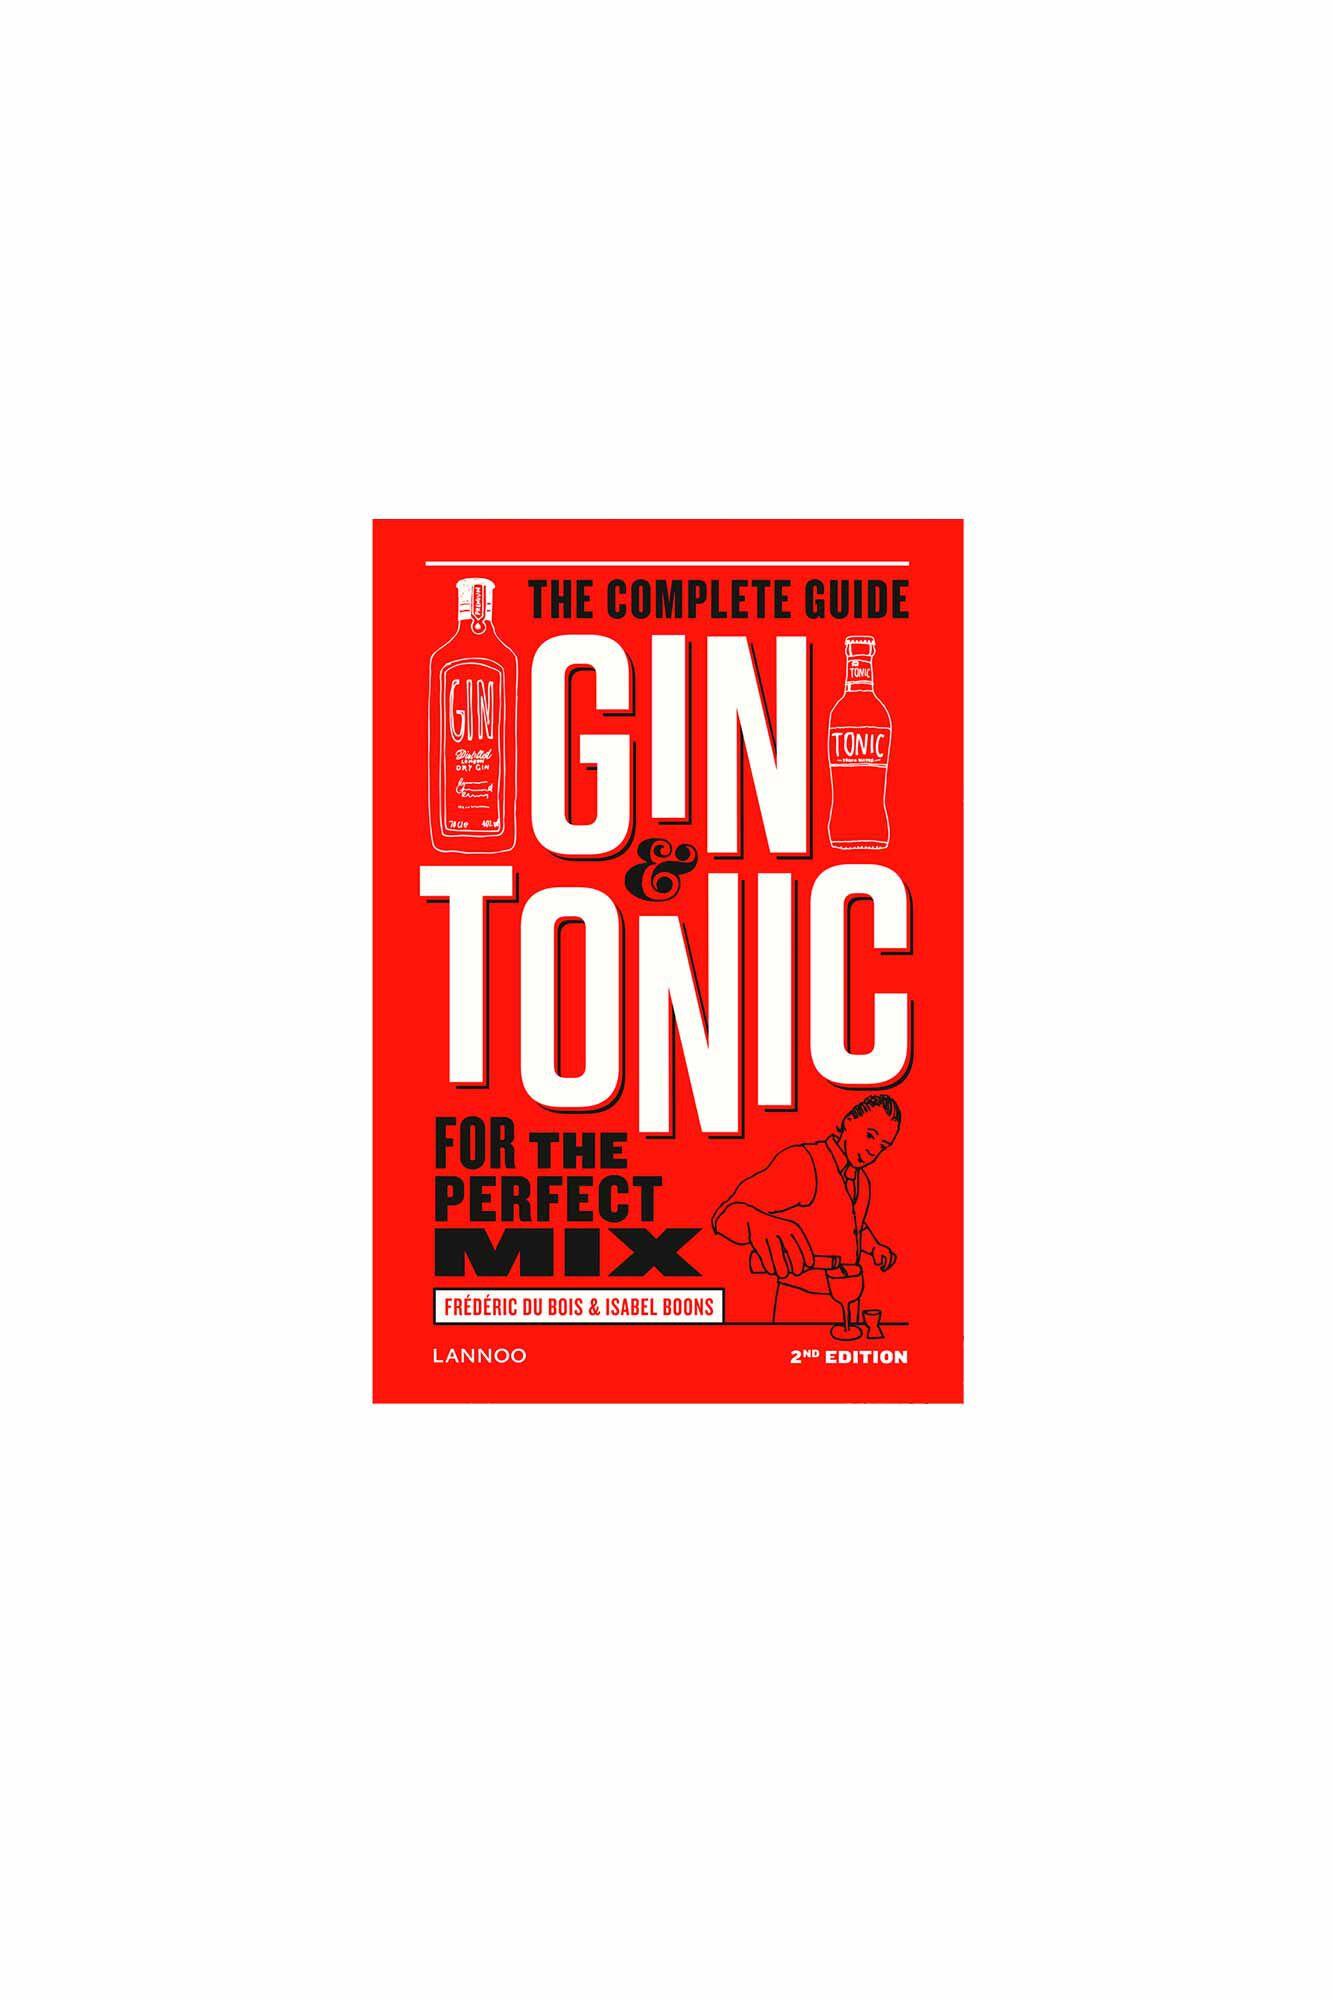 Gin & tonic LA1002